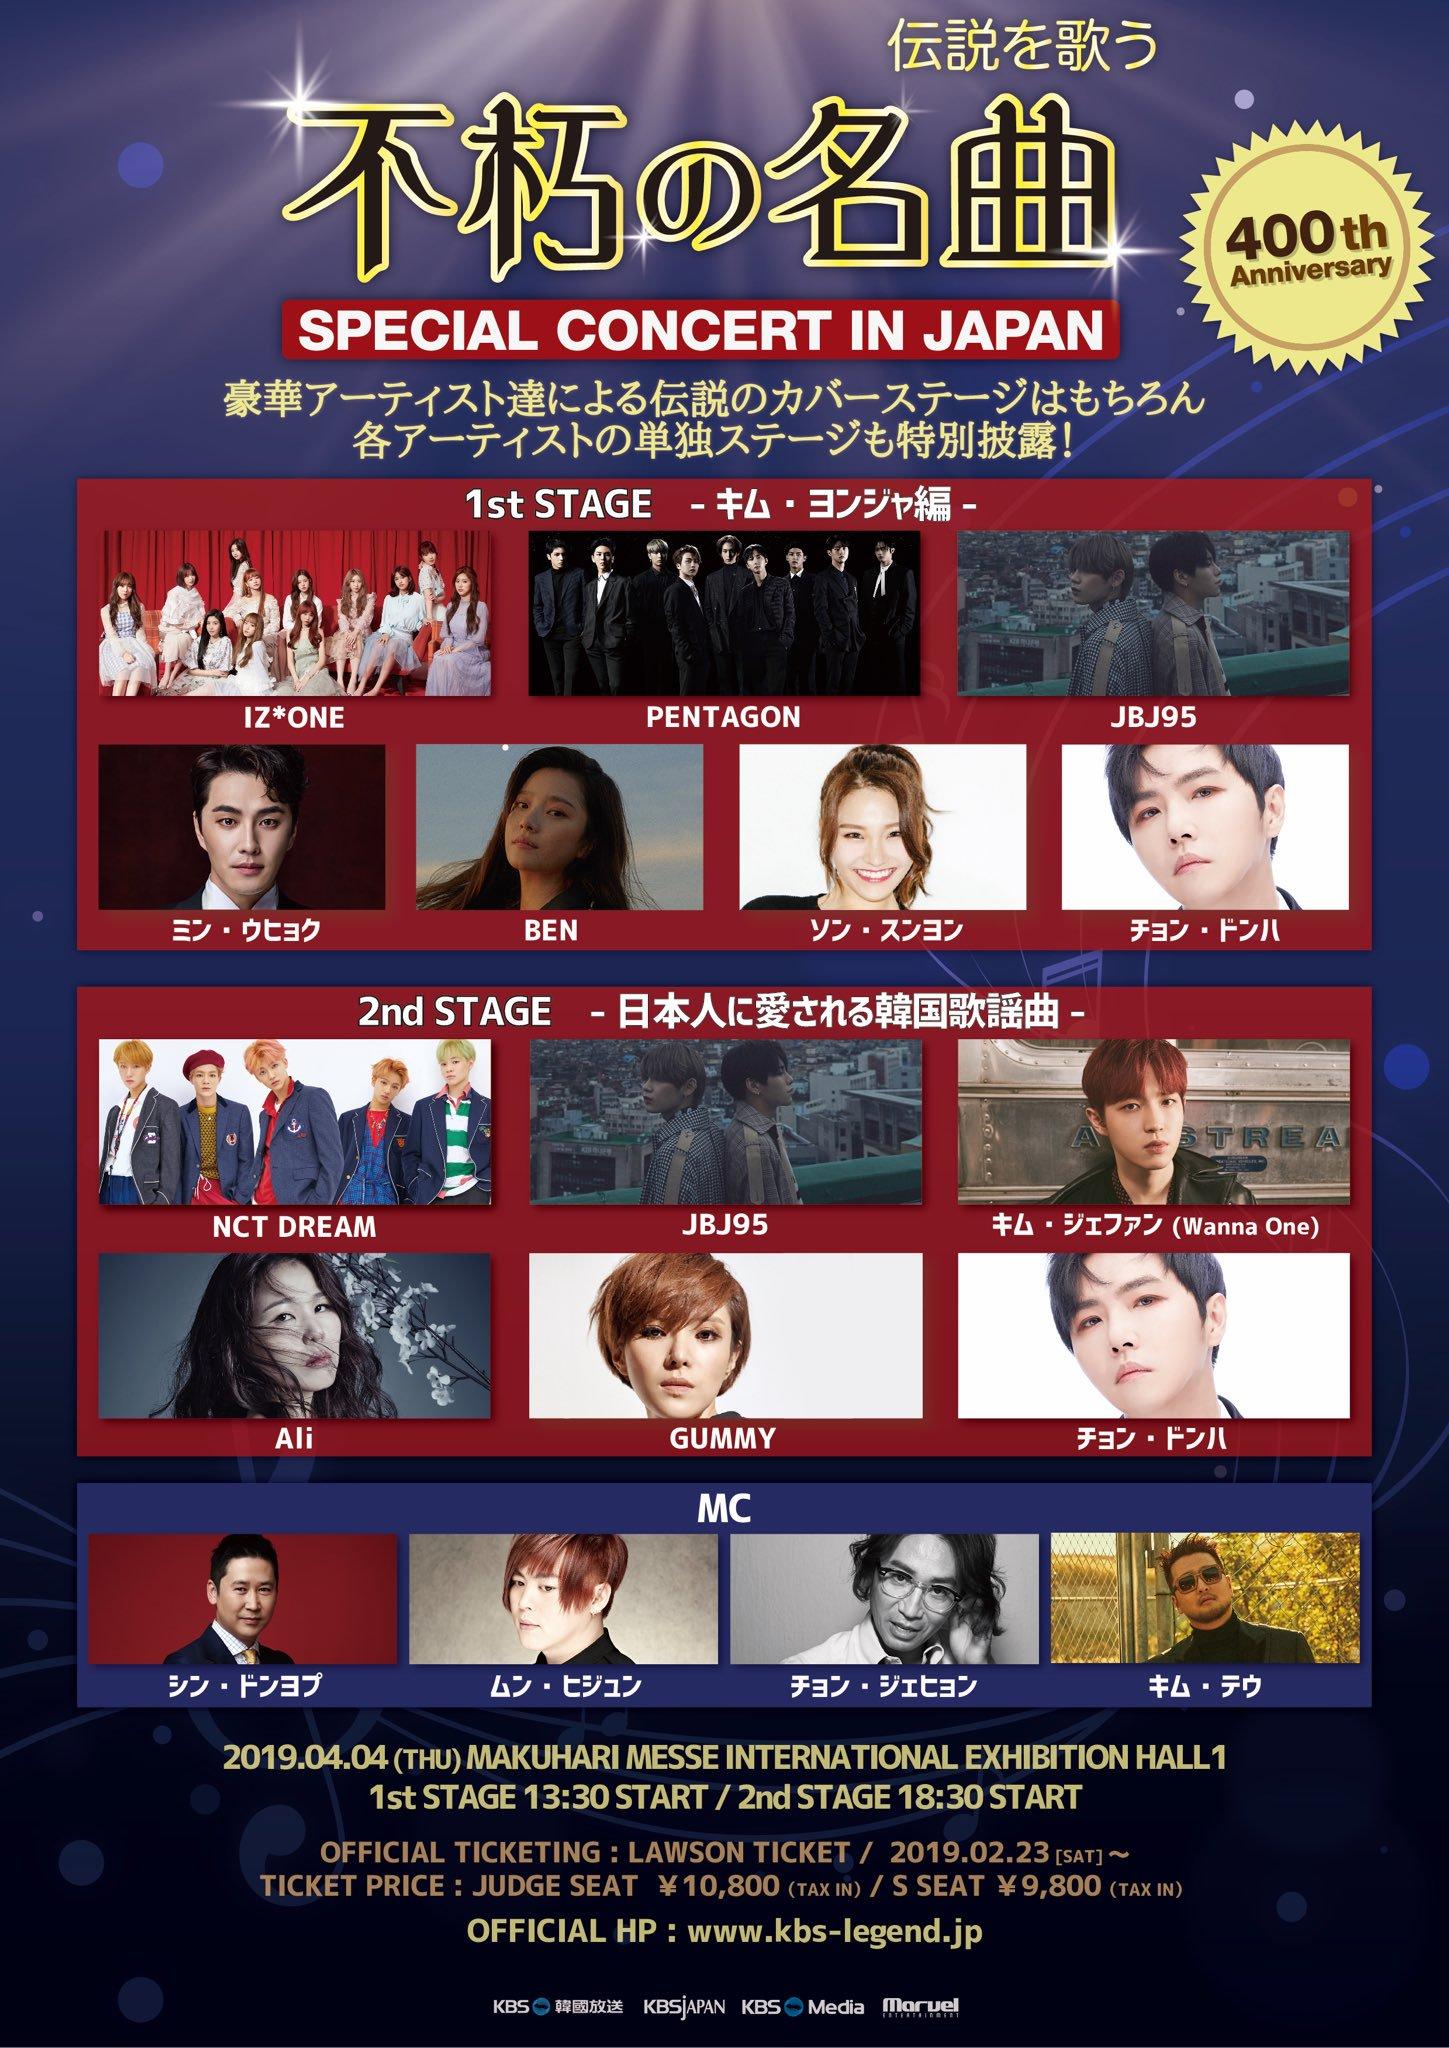 immortal song, immortal song in japan, nct dream, izone, pentagon, jbj95, ali, gummy, kim jaehwan, ben, immortal song lineup